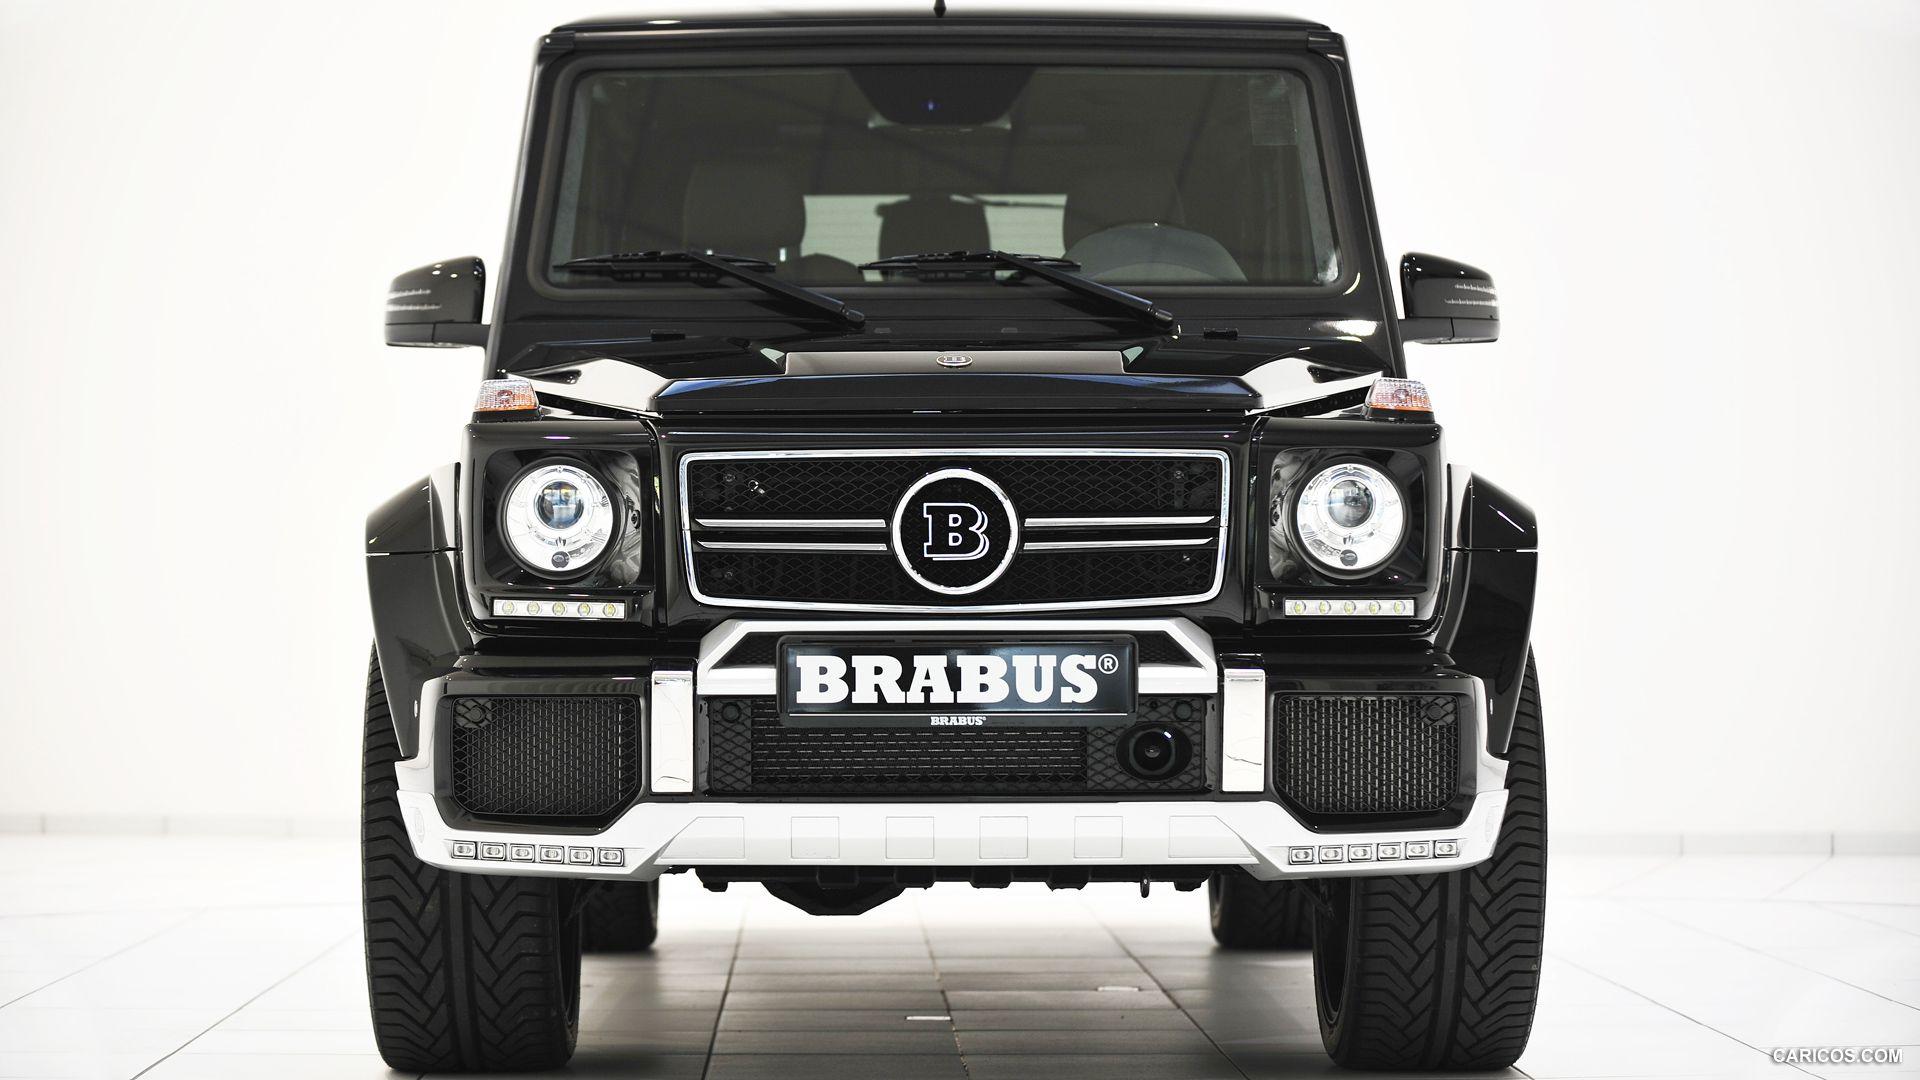 2013 BRABUS B63 620 WIDESTAR based on M Benz G63 AMG Front HD